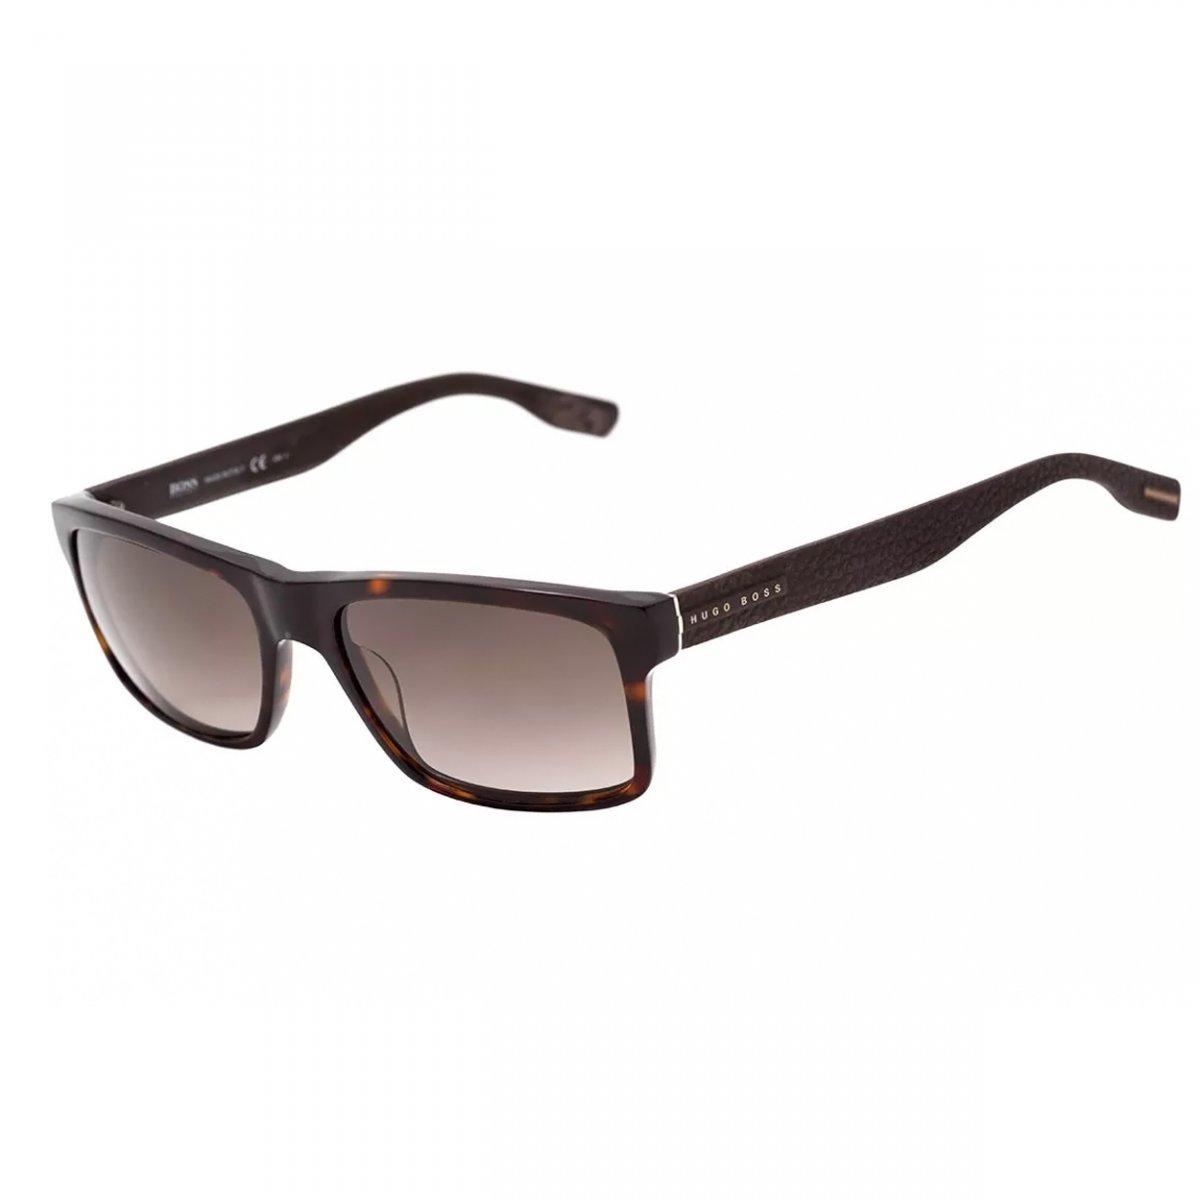 4931458ec Óculos de Sol Masculino Hugo Boss | Óculos de Sol Hugo Boss BOSS ...